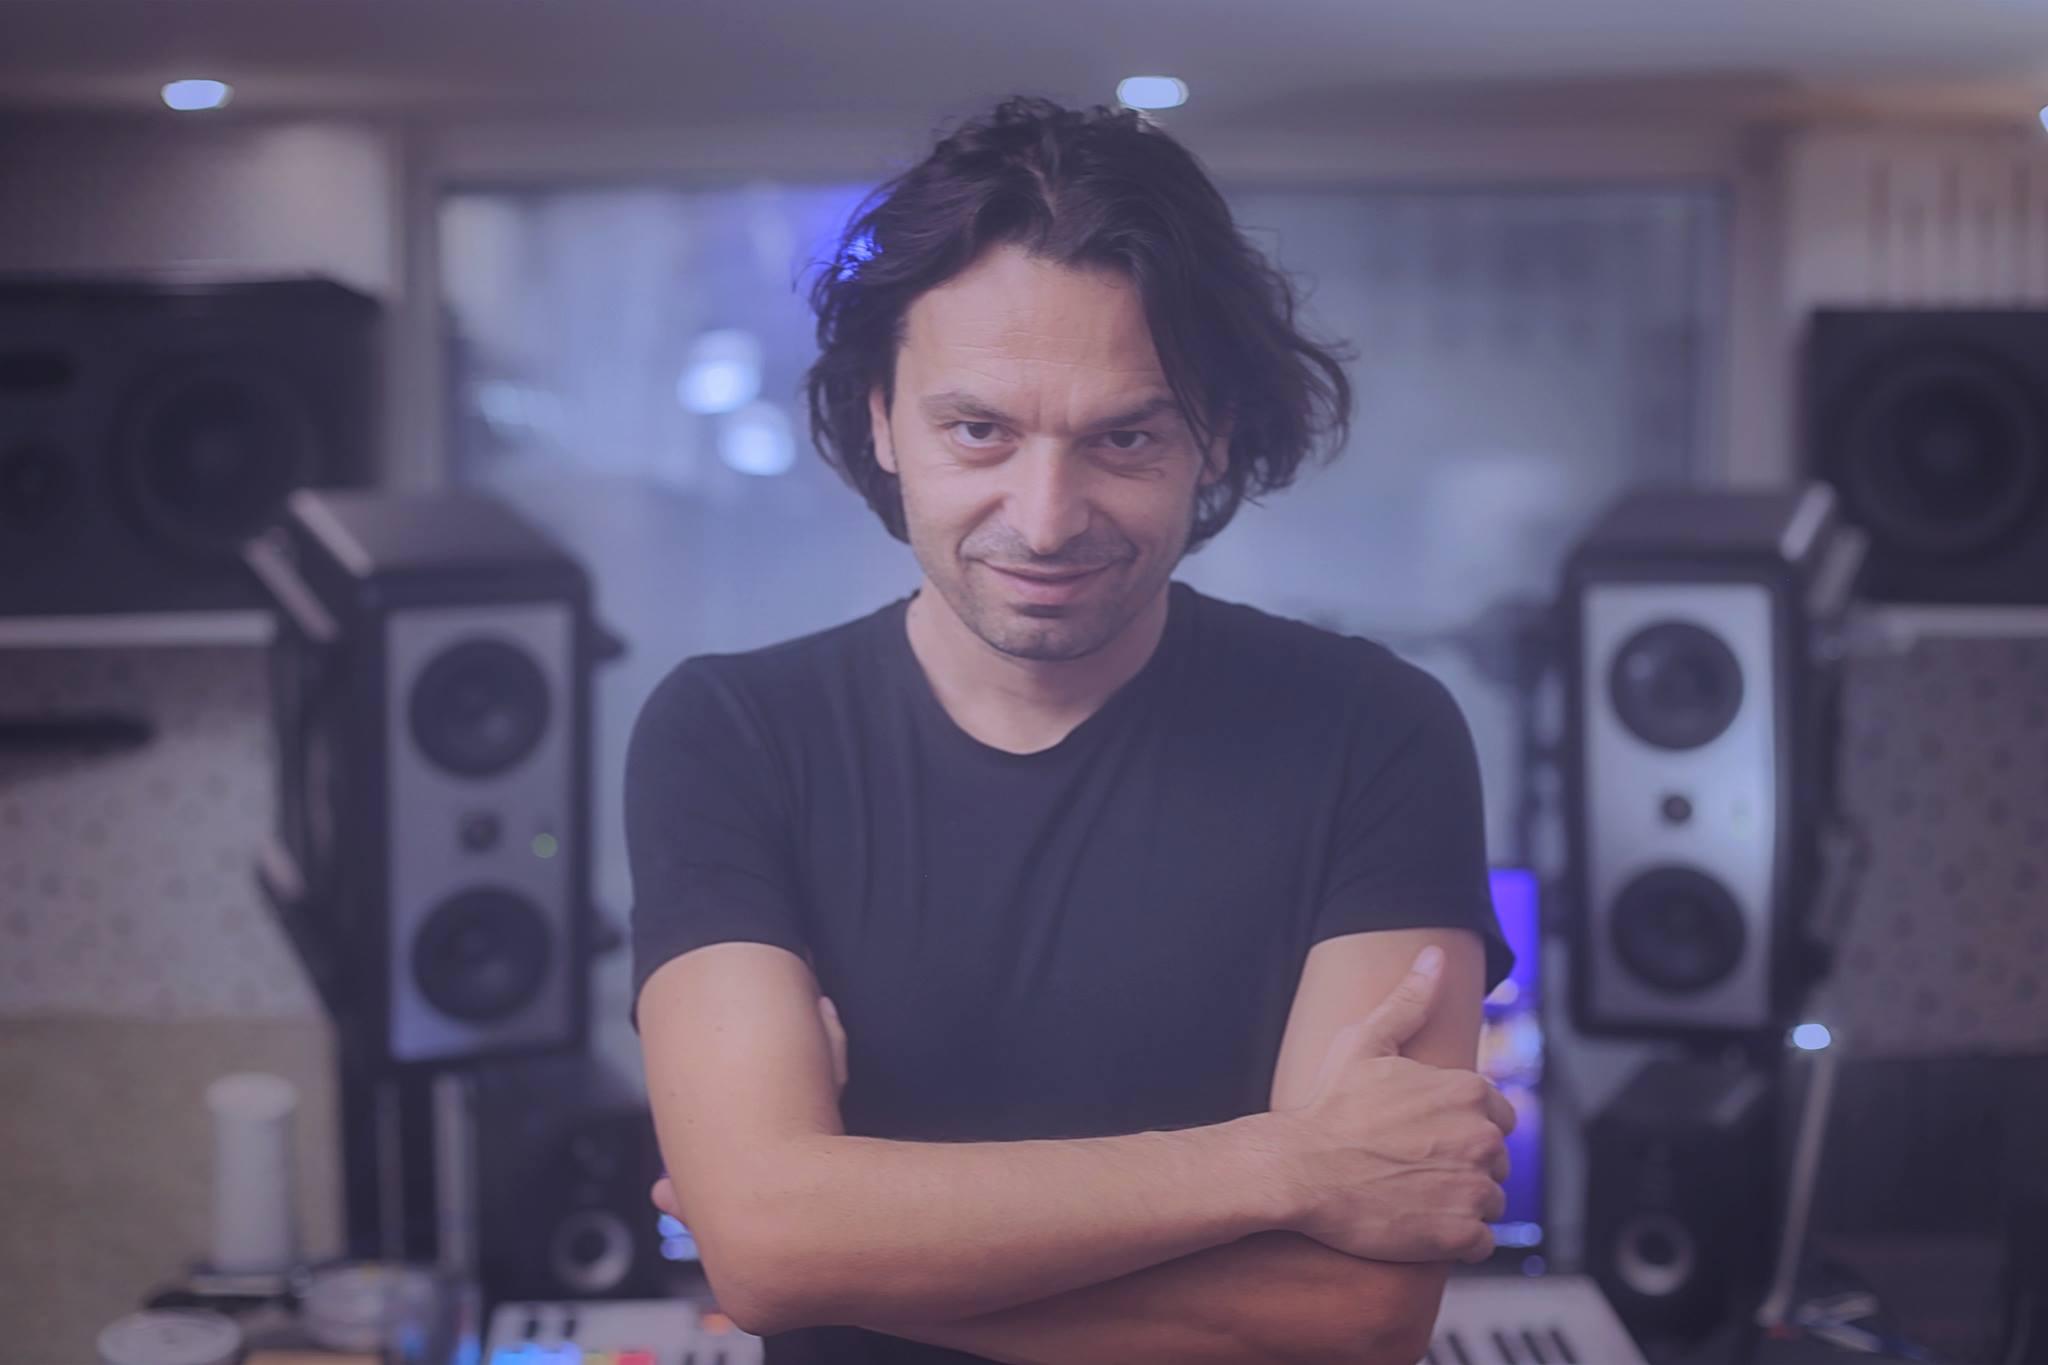 Darko Dimitrov